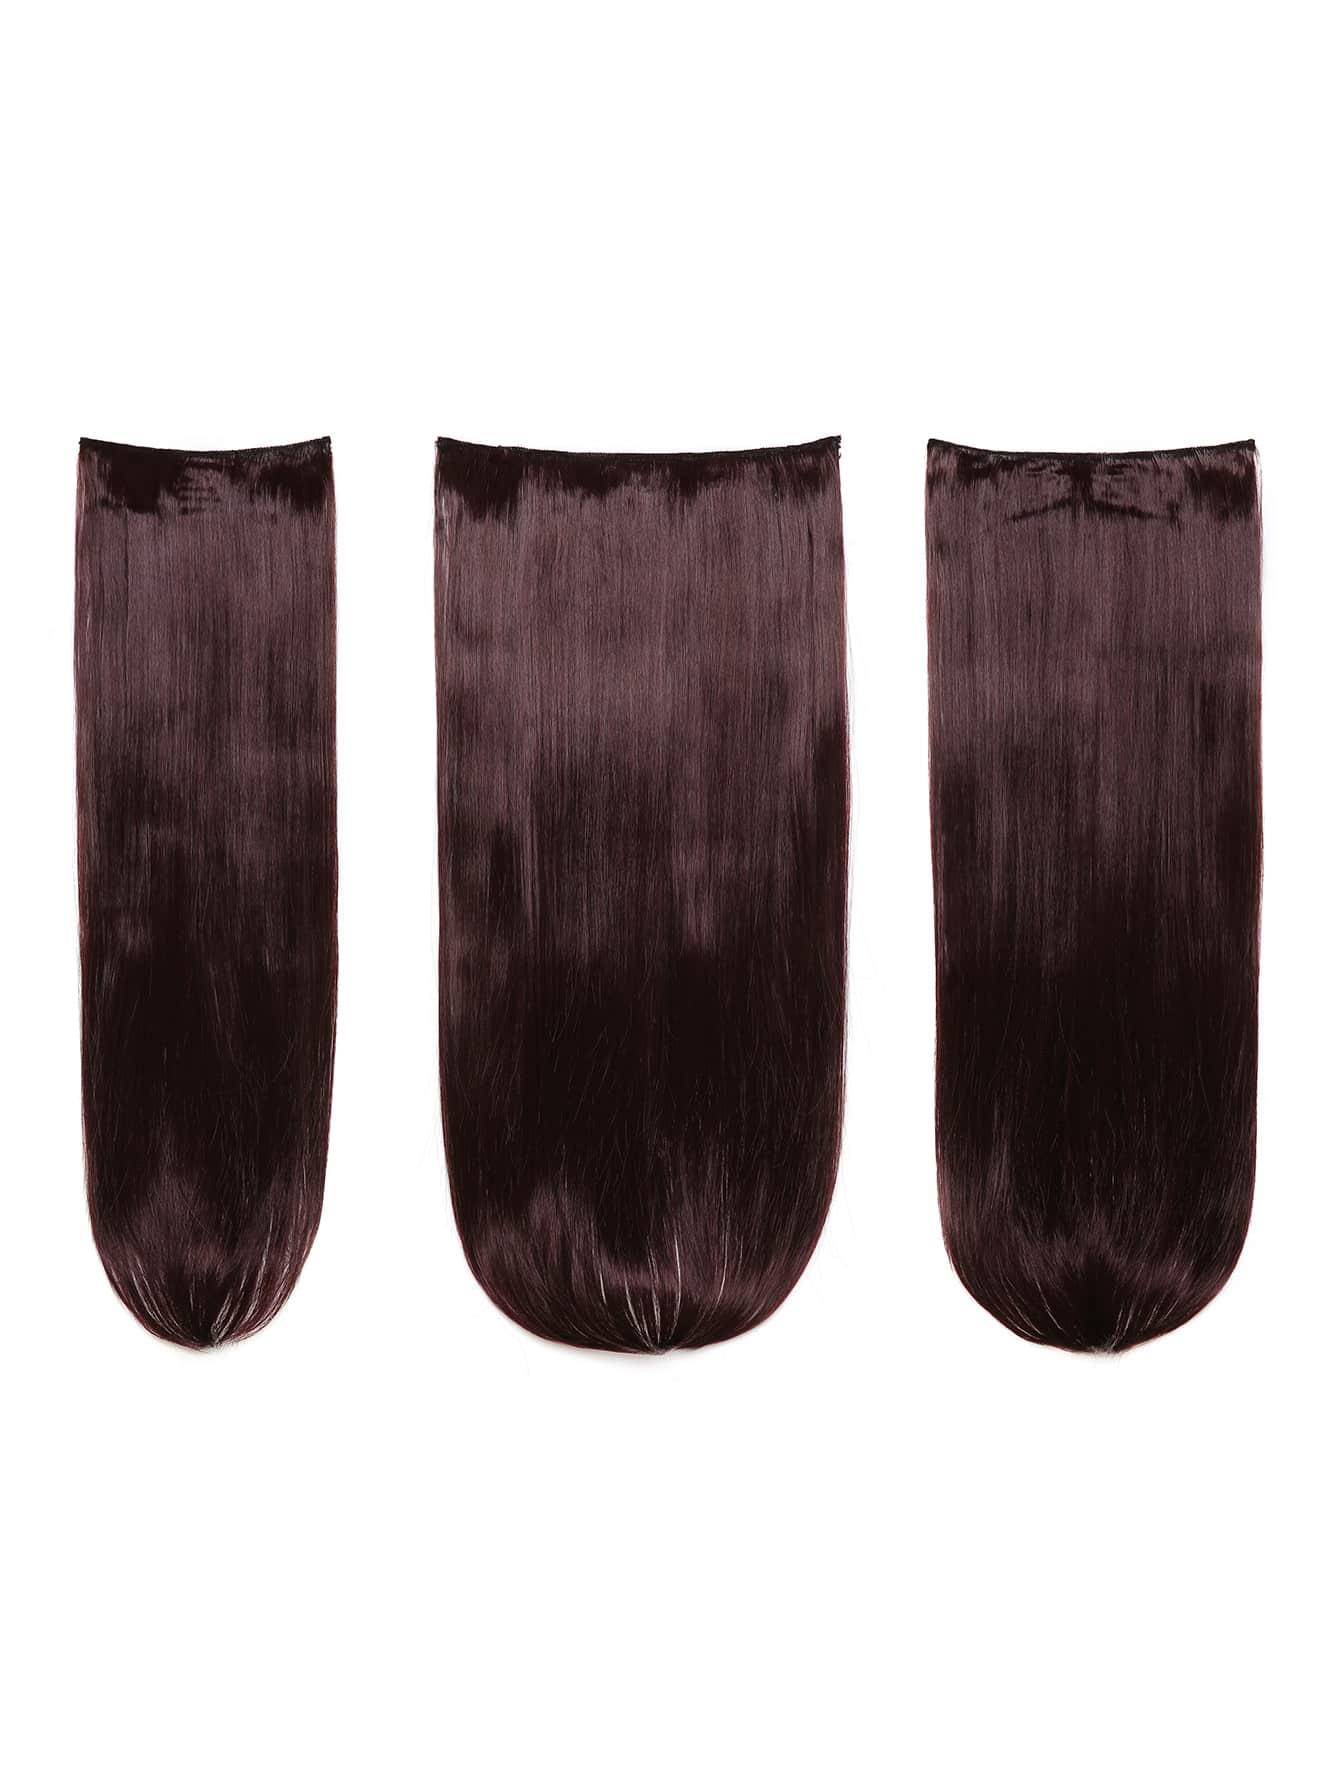 Plum Clip In Straight Hair Extension 3pcs